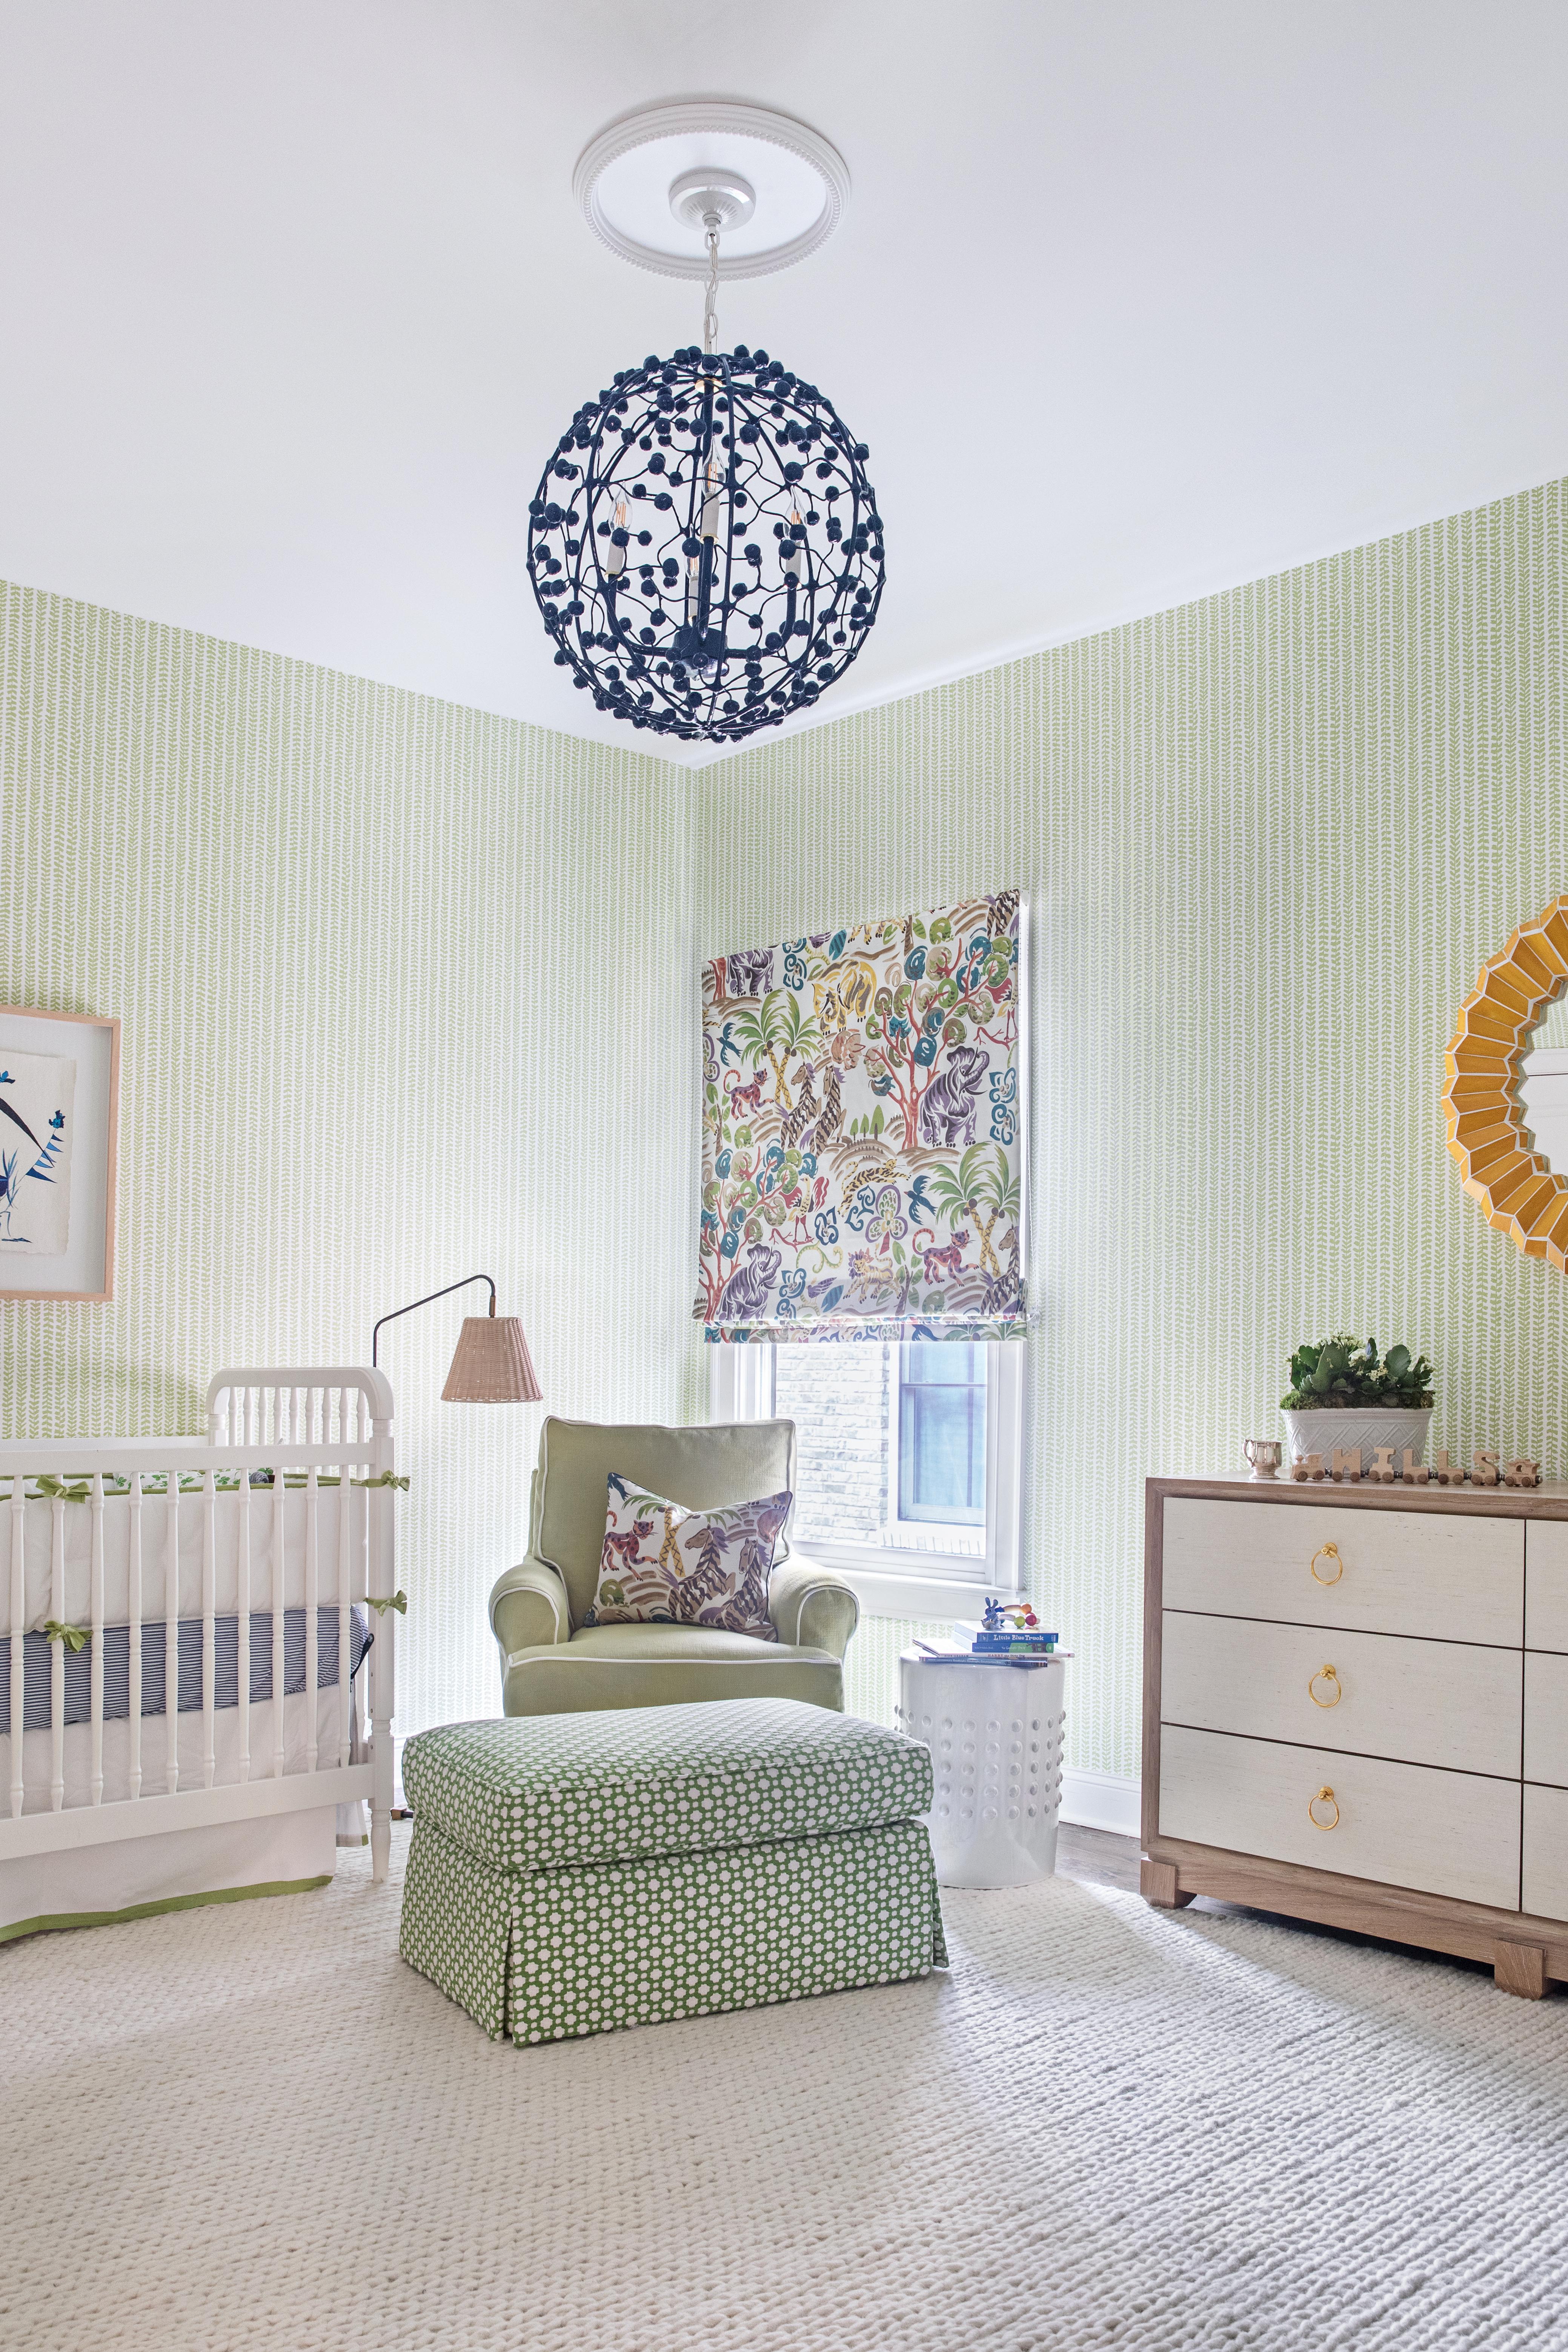 Will's Nursery Image 3